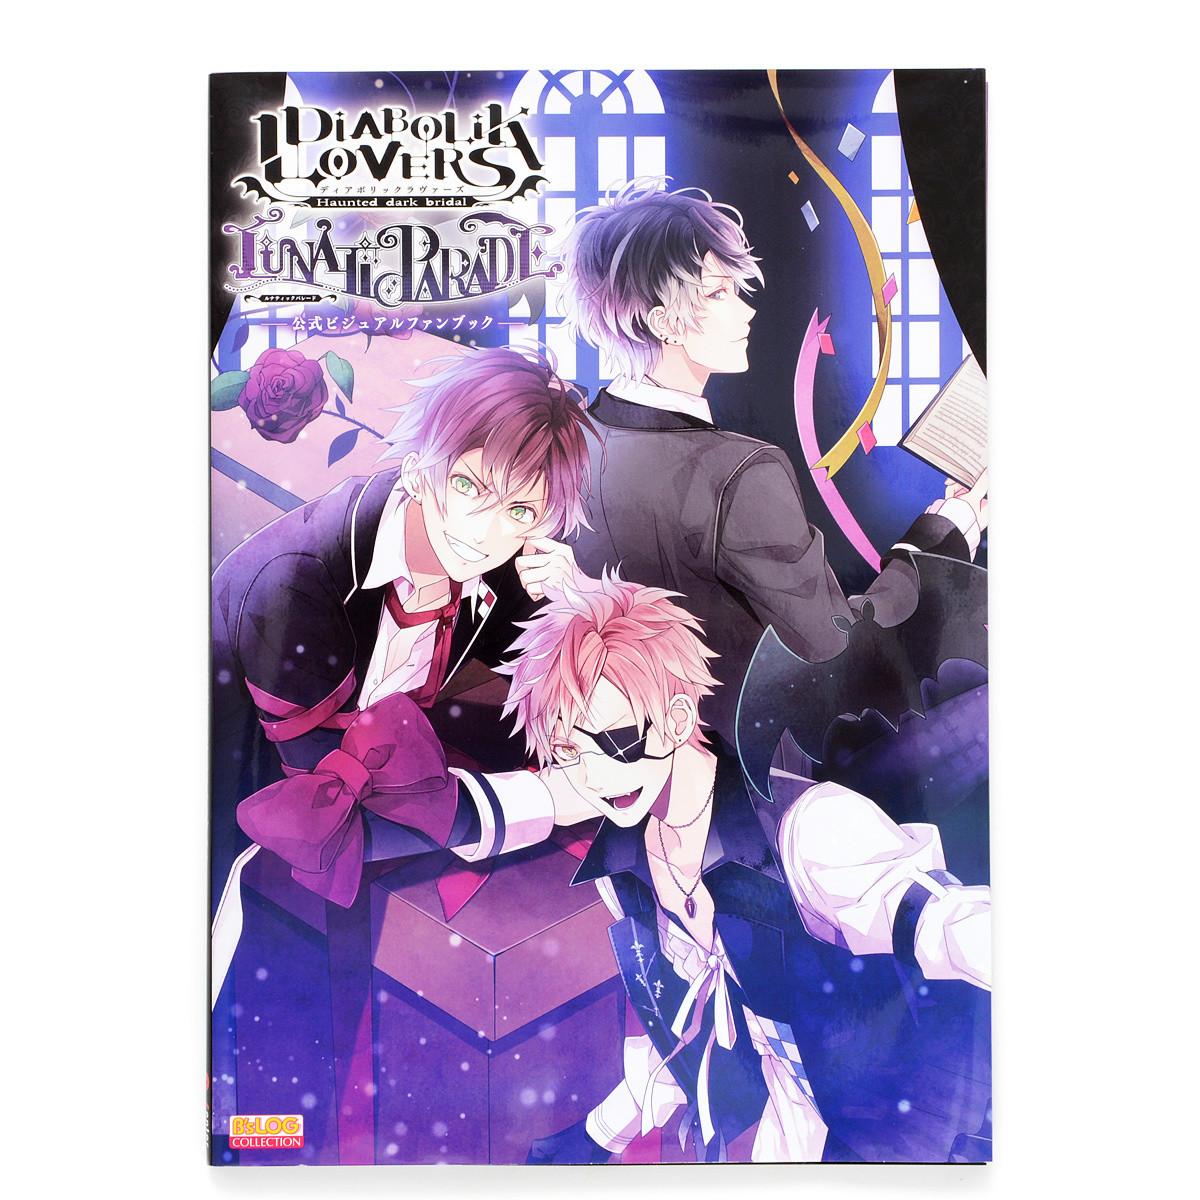 Diabolik Lovers Lunatic Parade Official Visual Fan Book